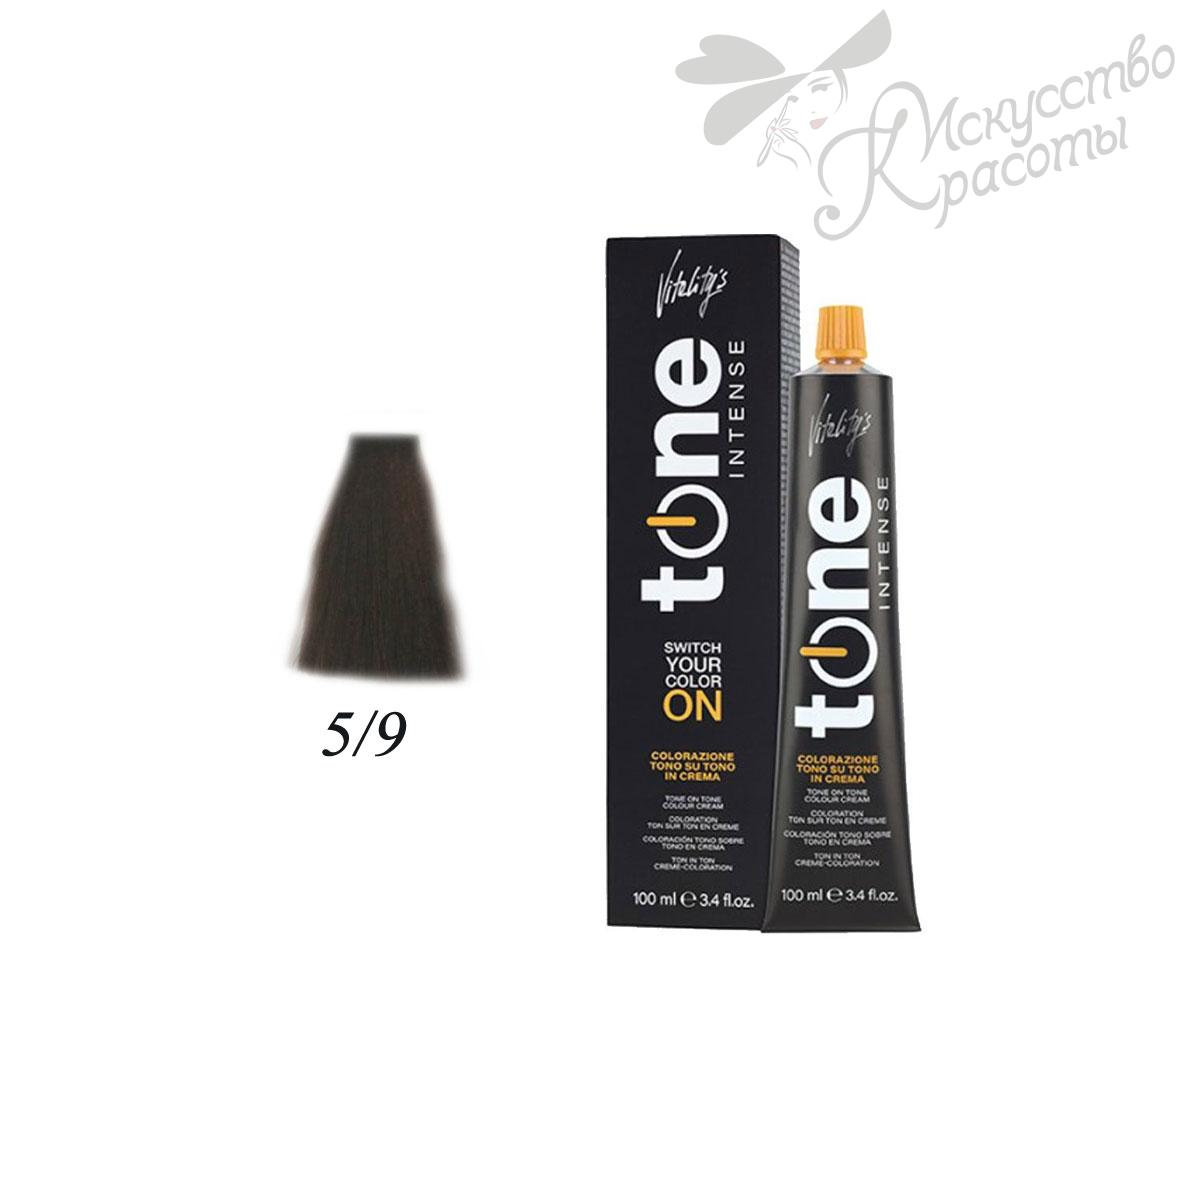 Краска для волос 5/9 коричневый светло-каштановый Tone Intense Vitality's 100мл